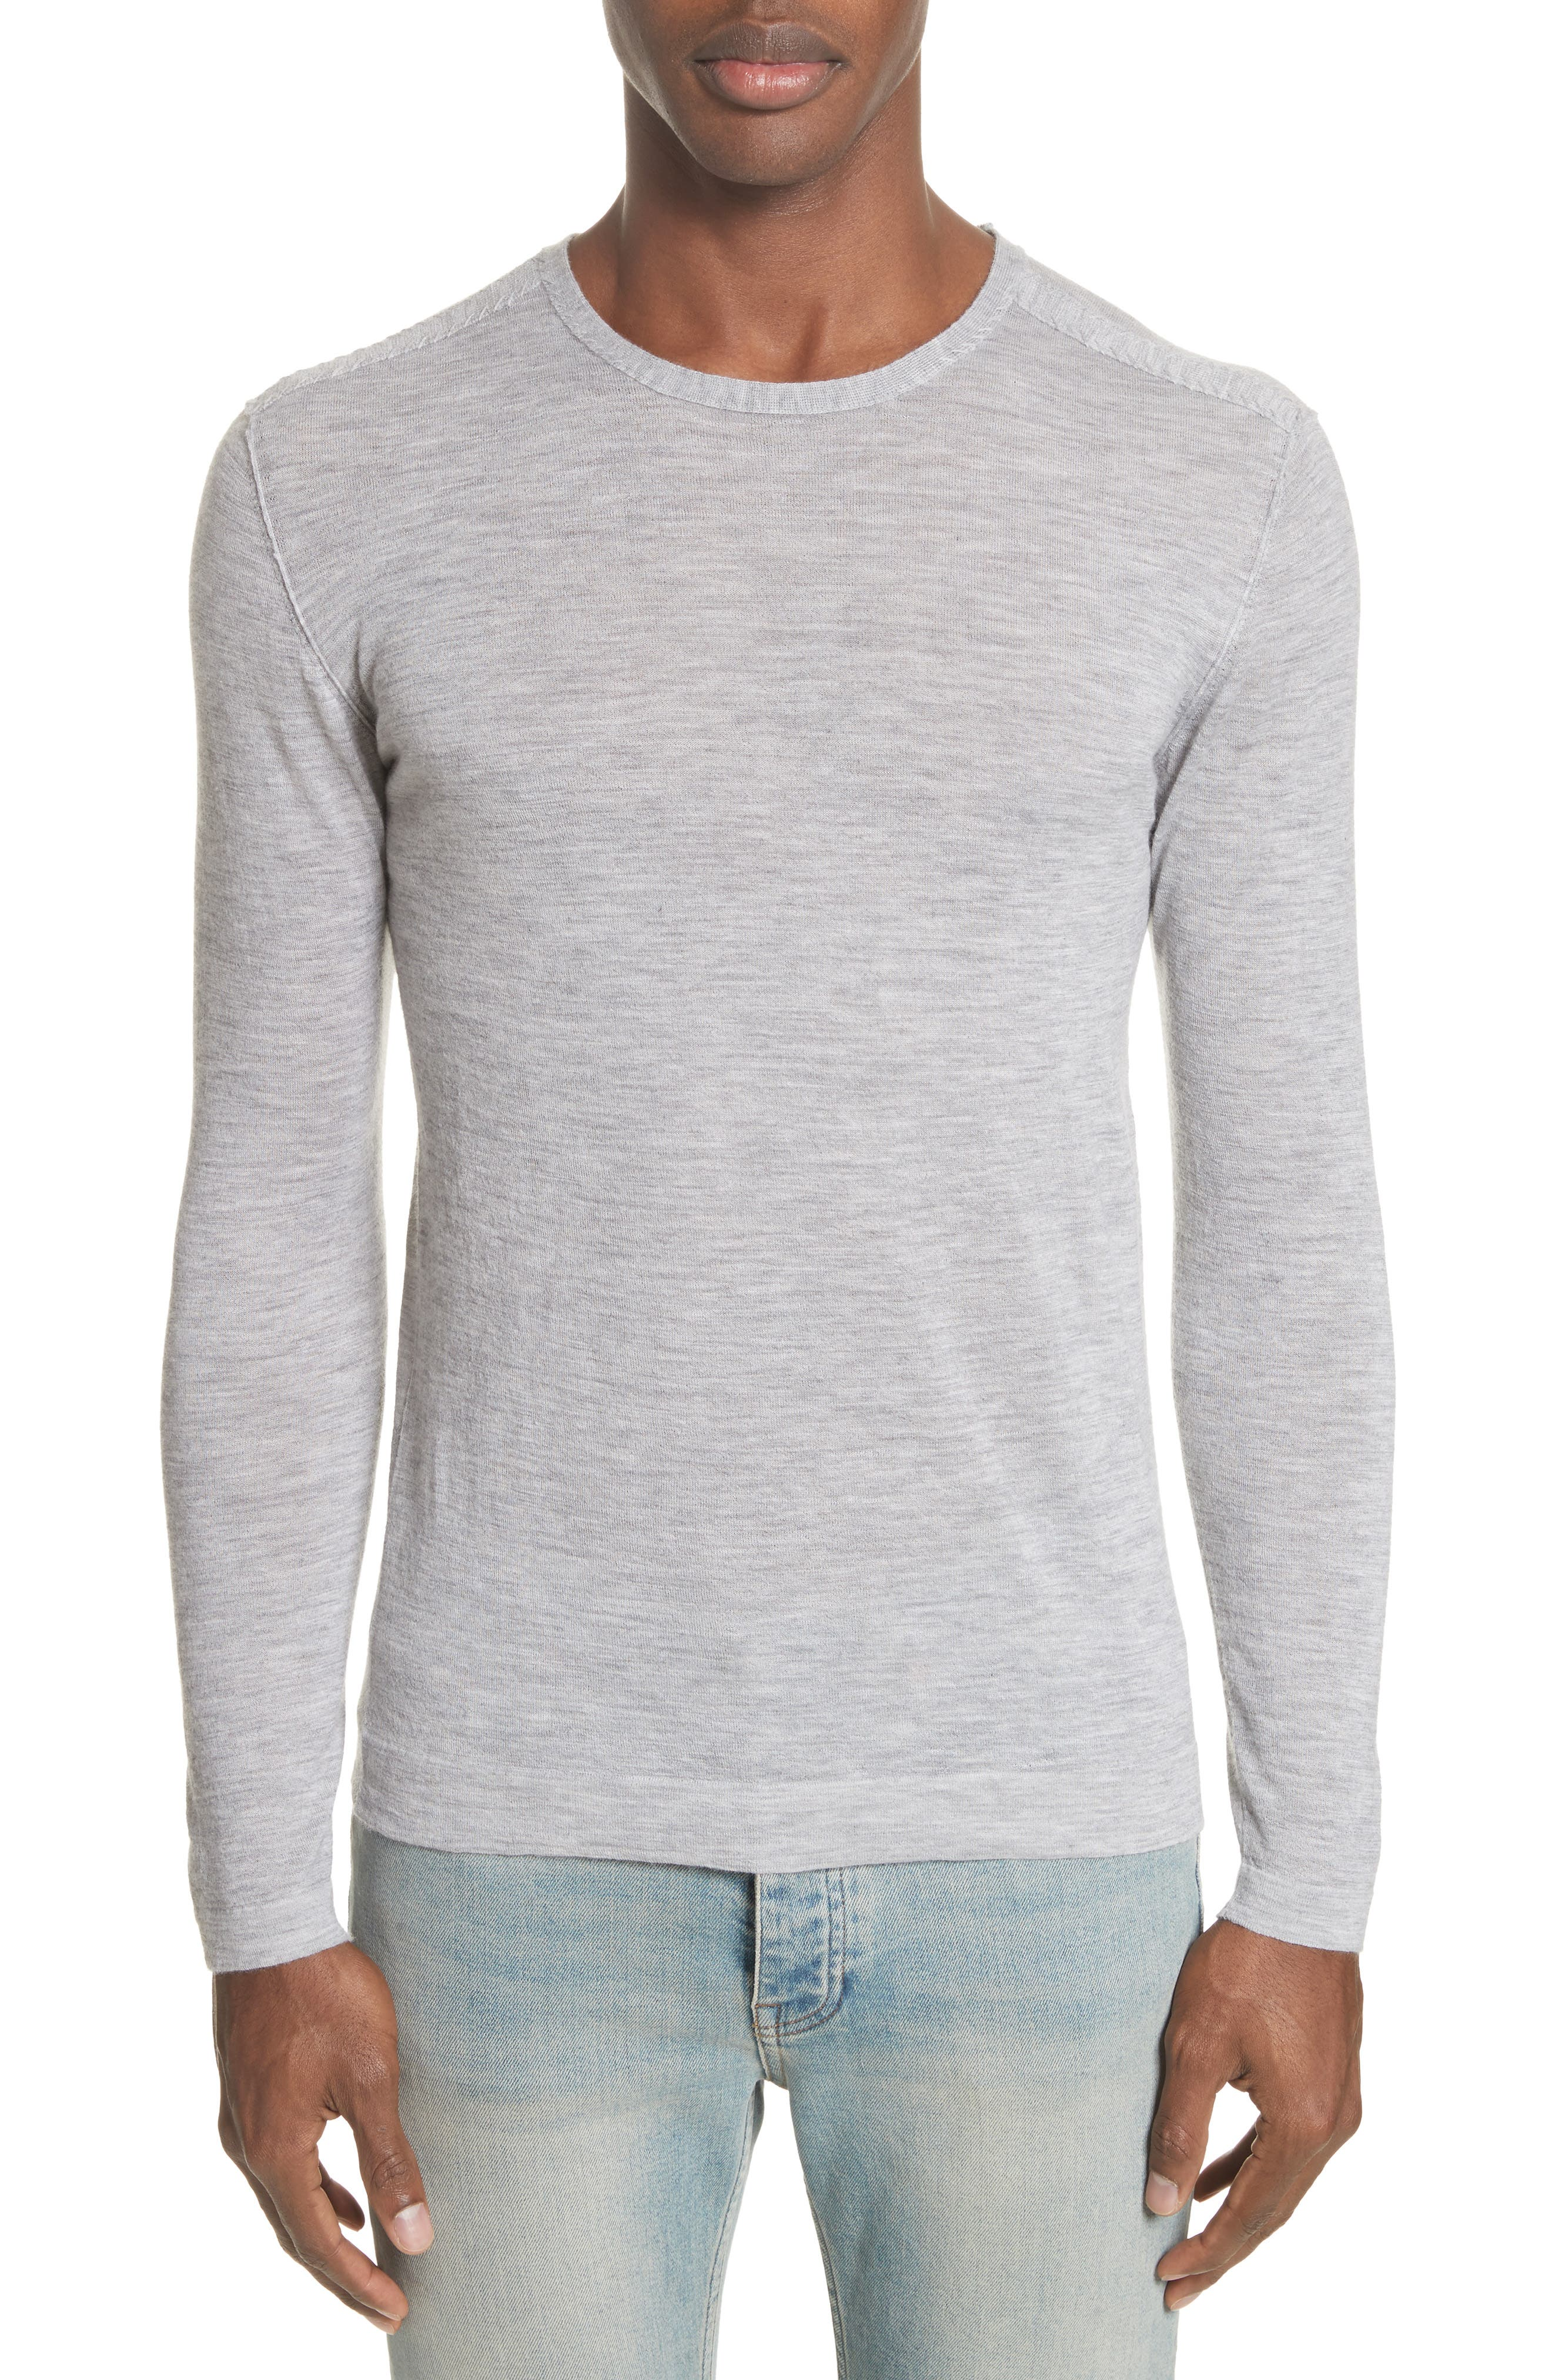 Cashmere Crewneck Sweater,                             Main thumbnail 1, color,                             055